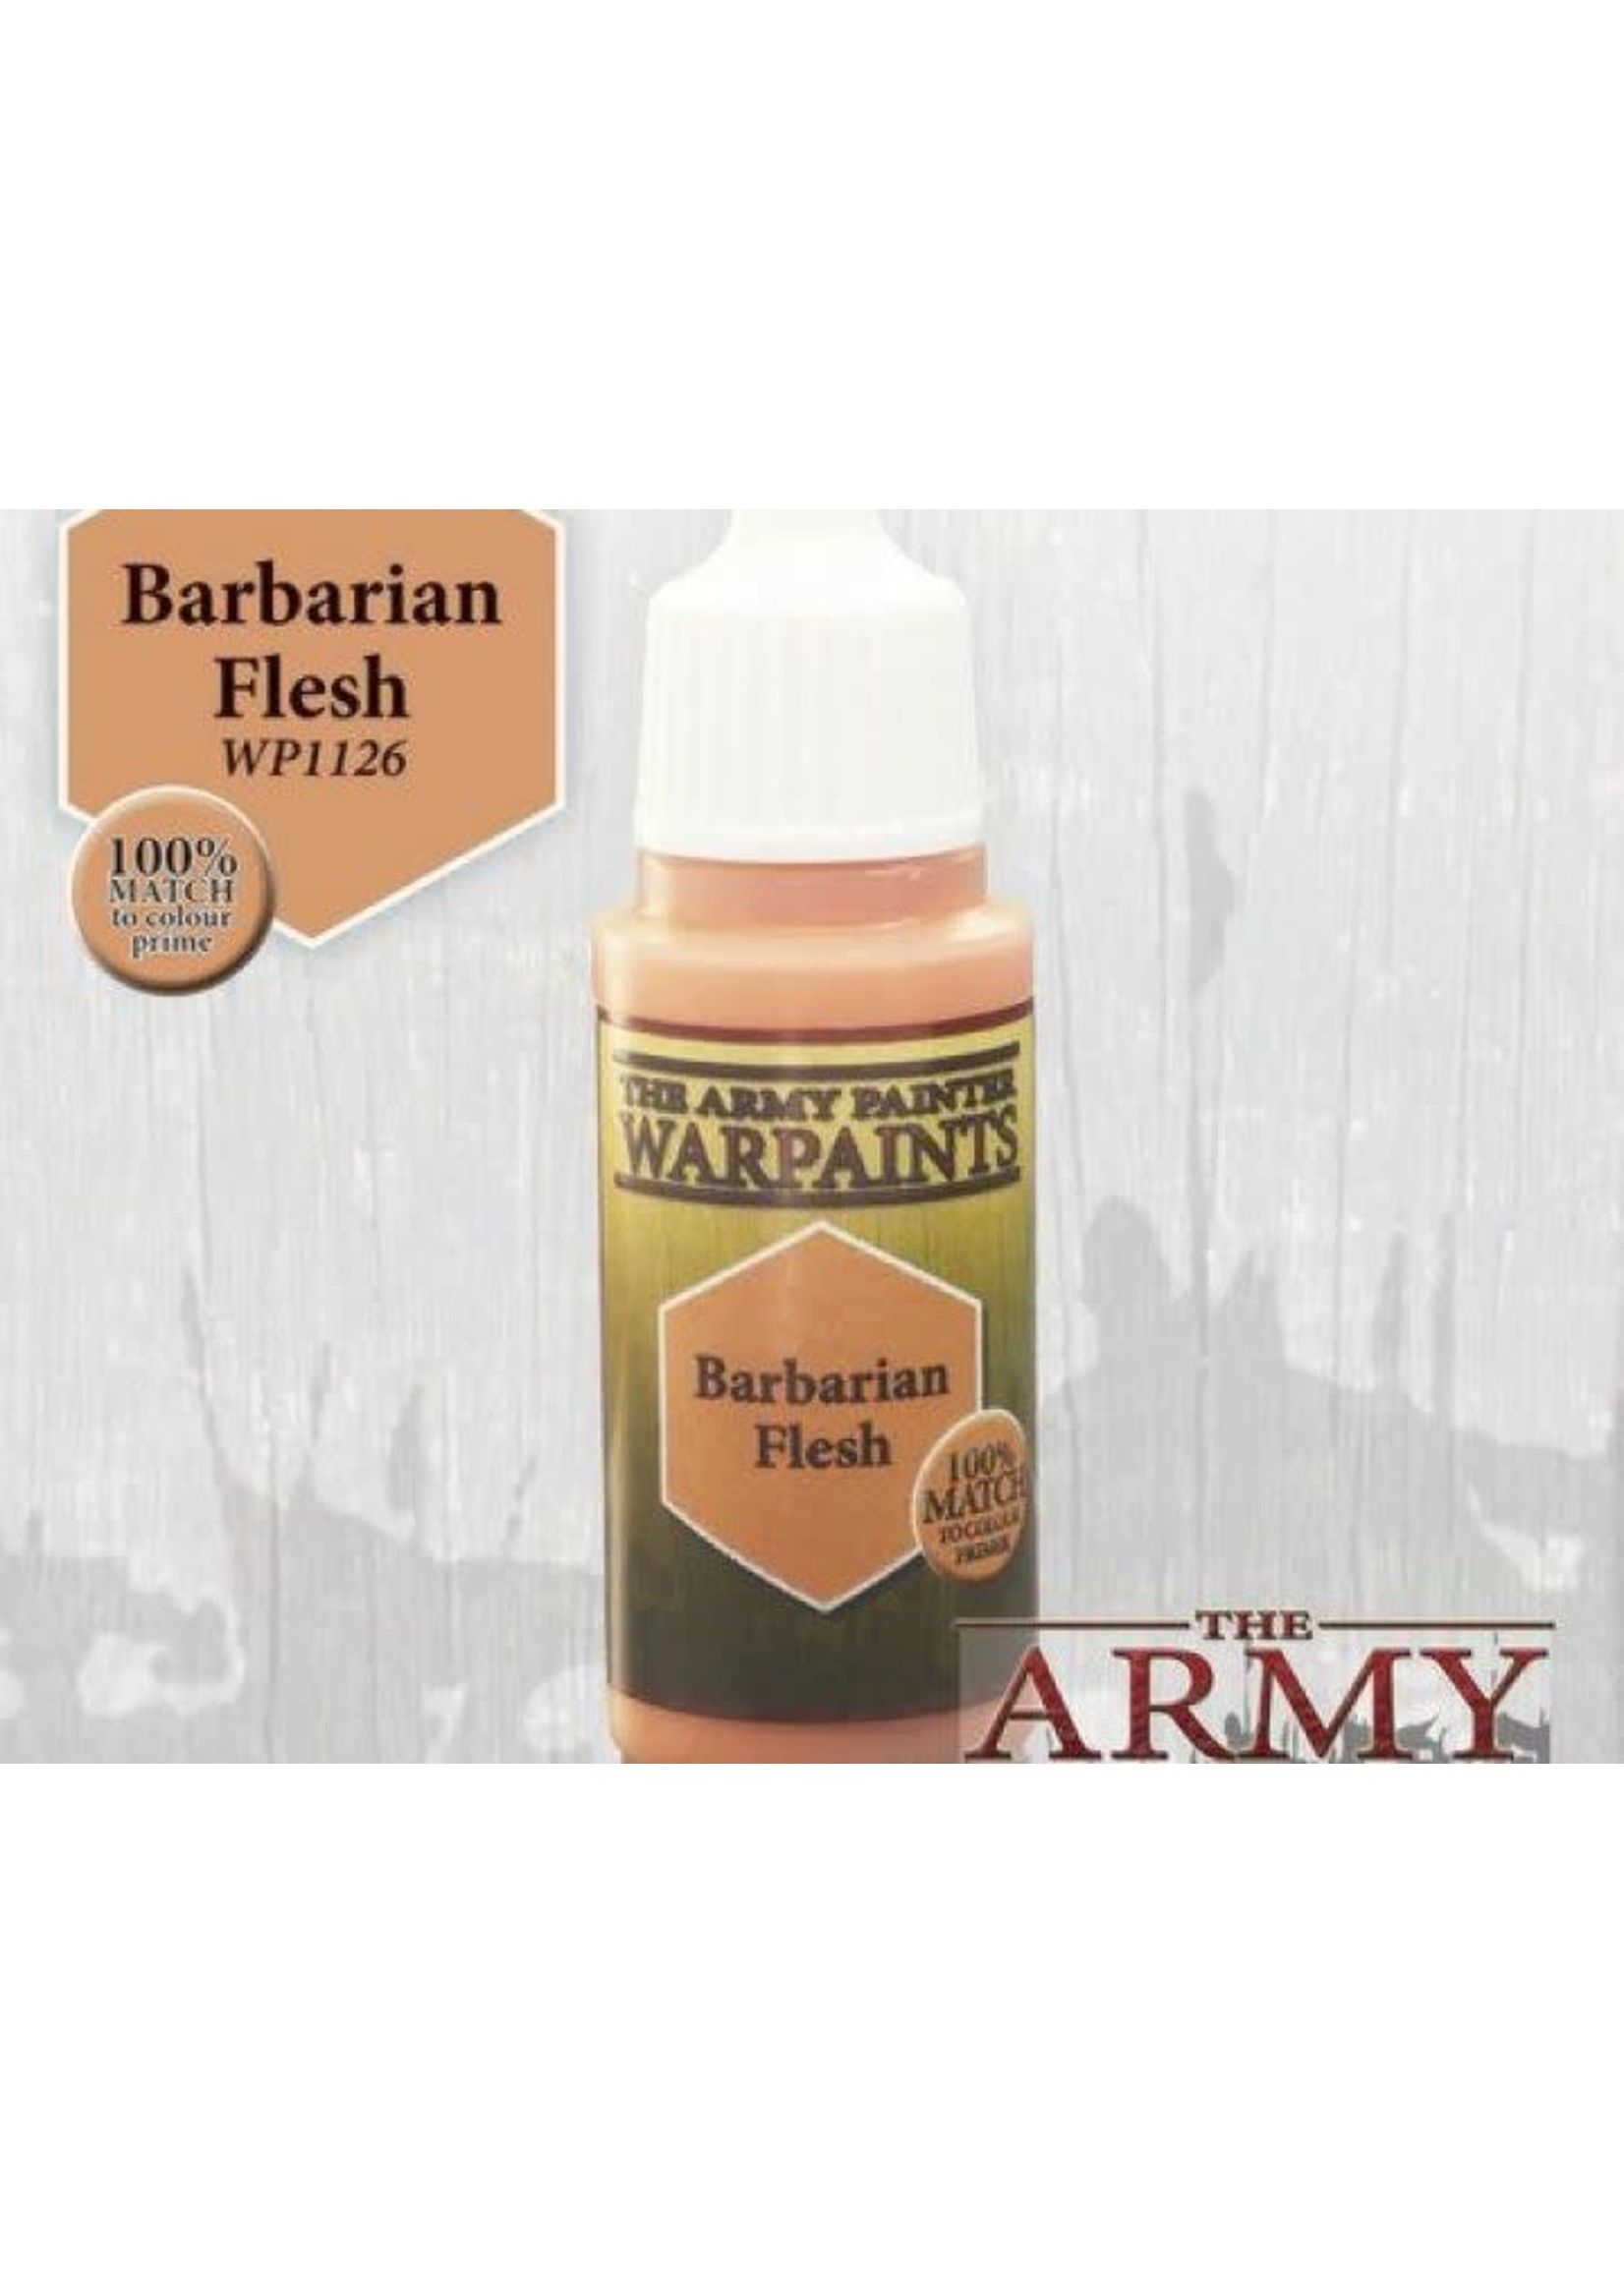 Army Painter Warpaints - Barbarian Flesh